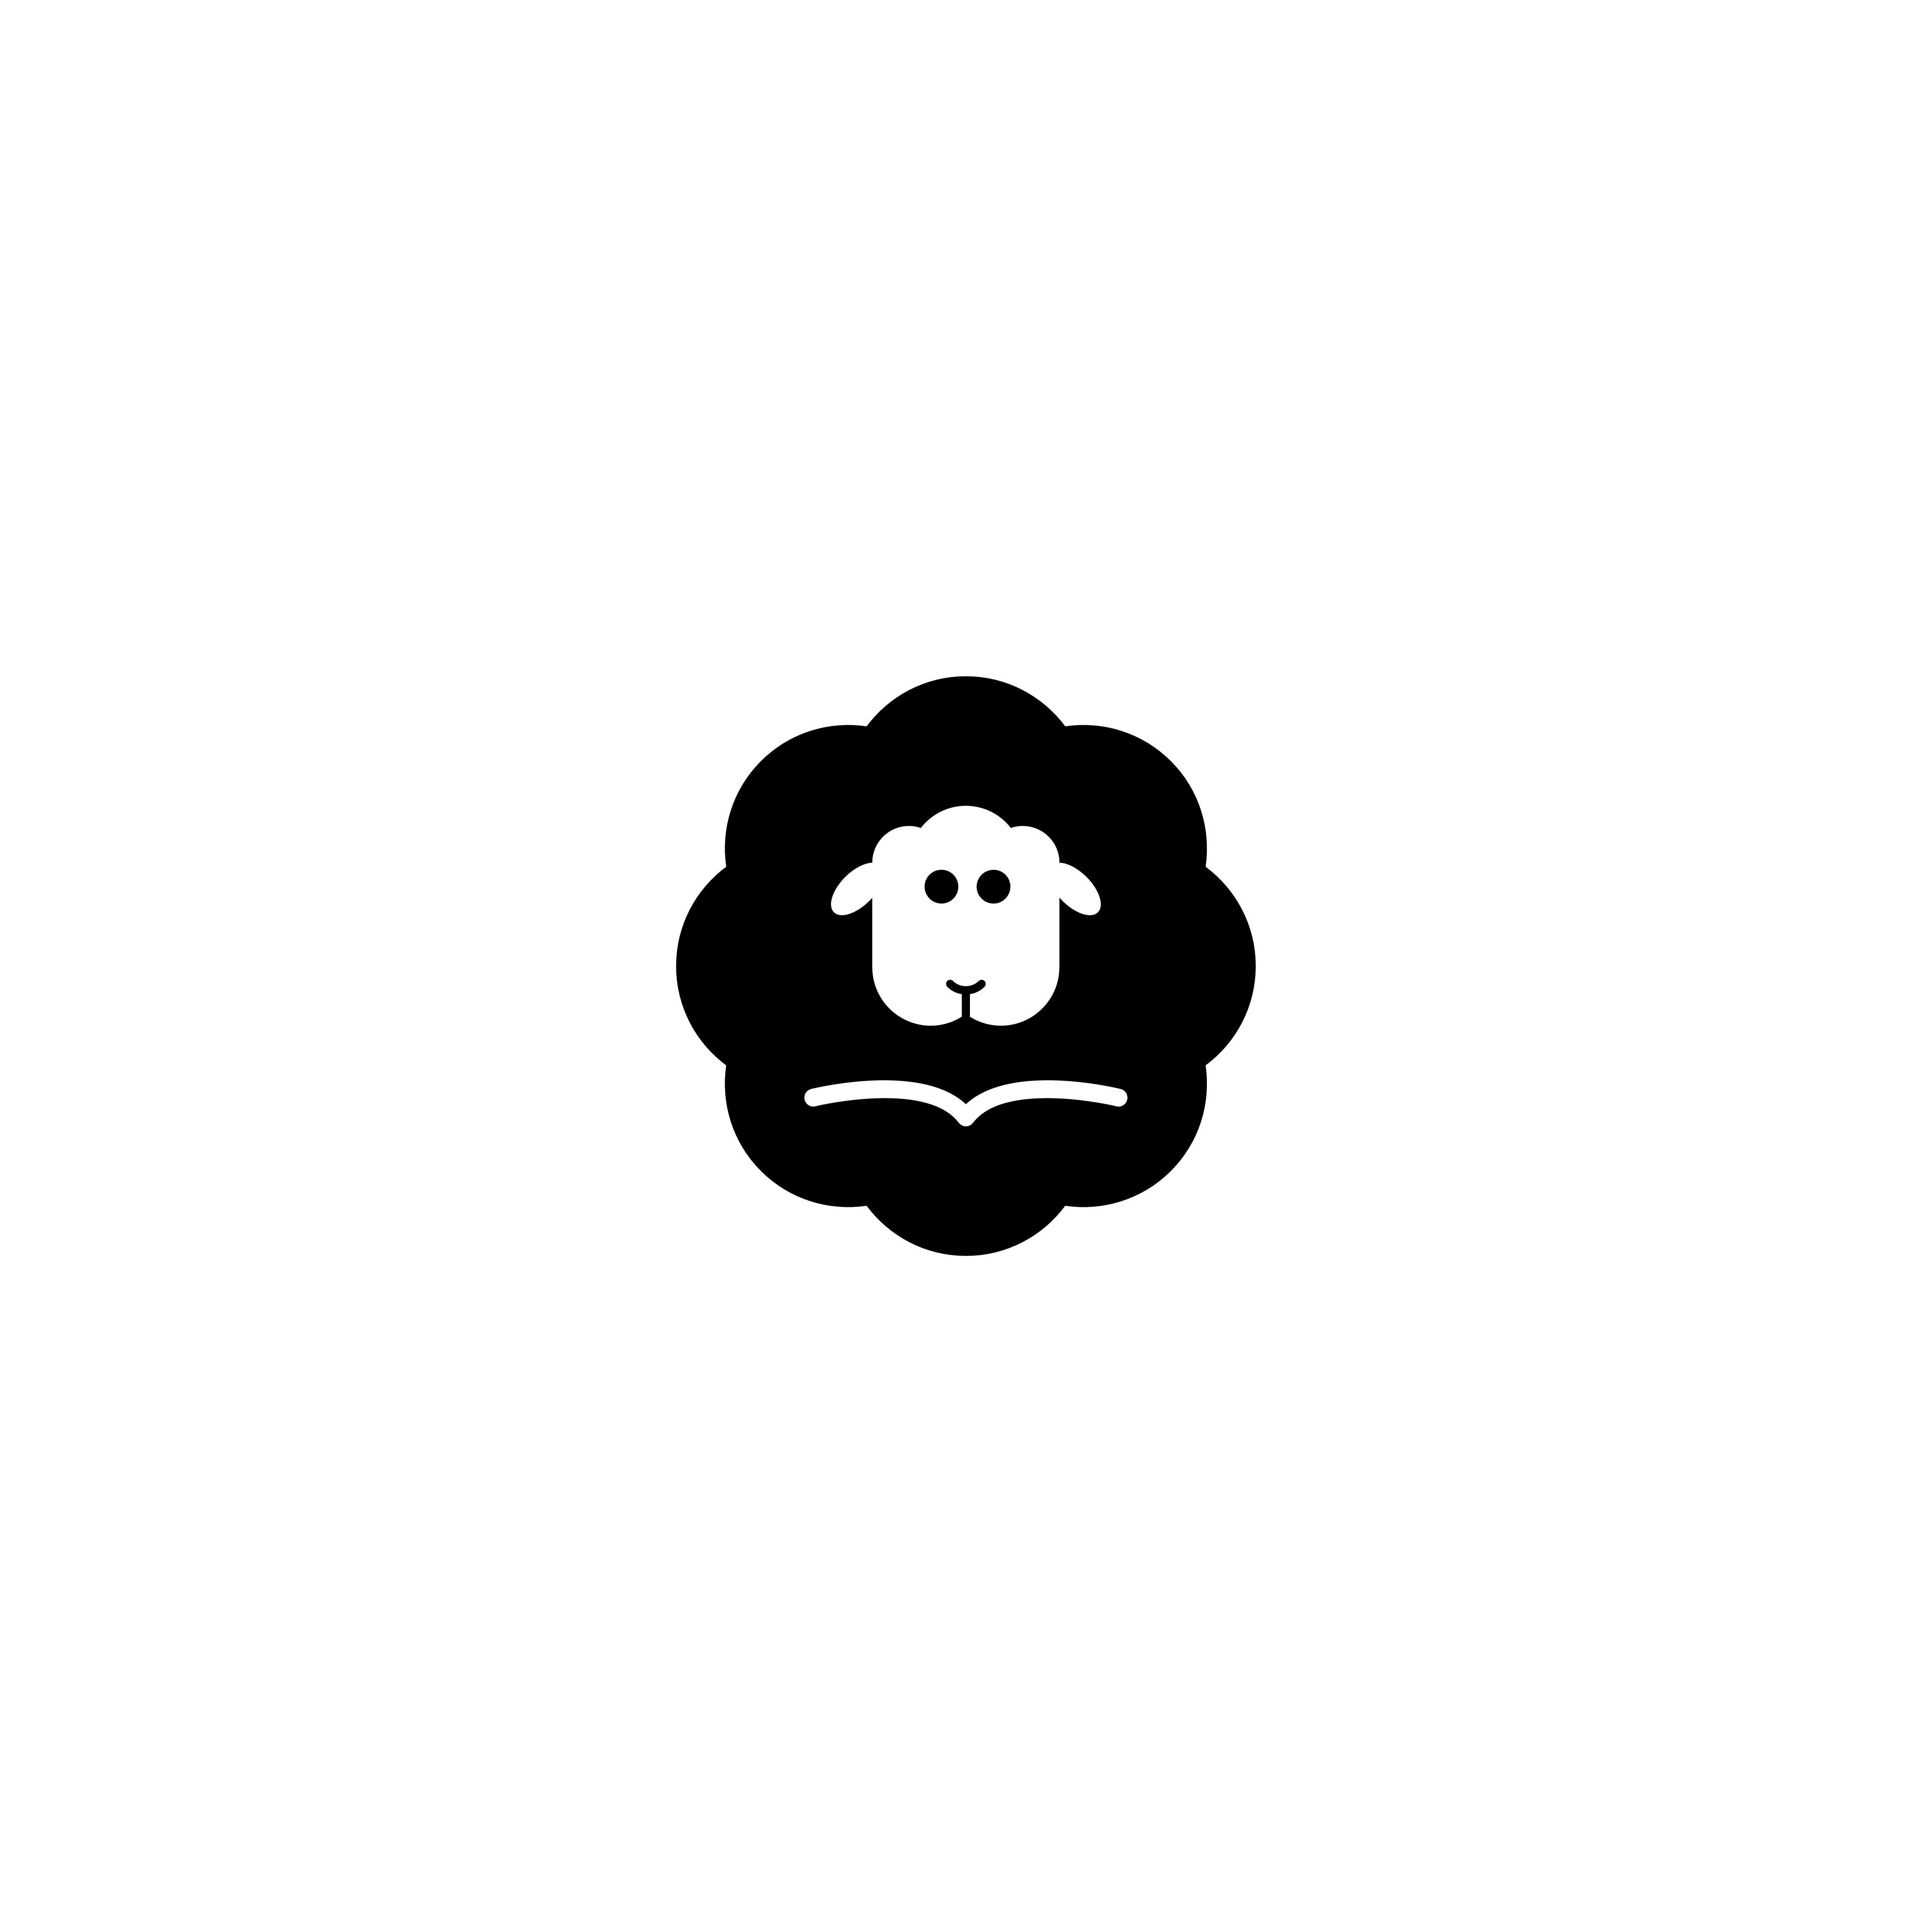 Book-blogger needs your logo-magic!